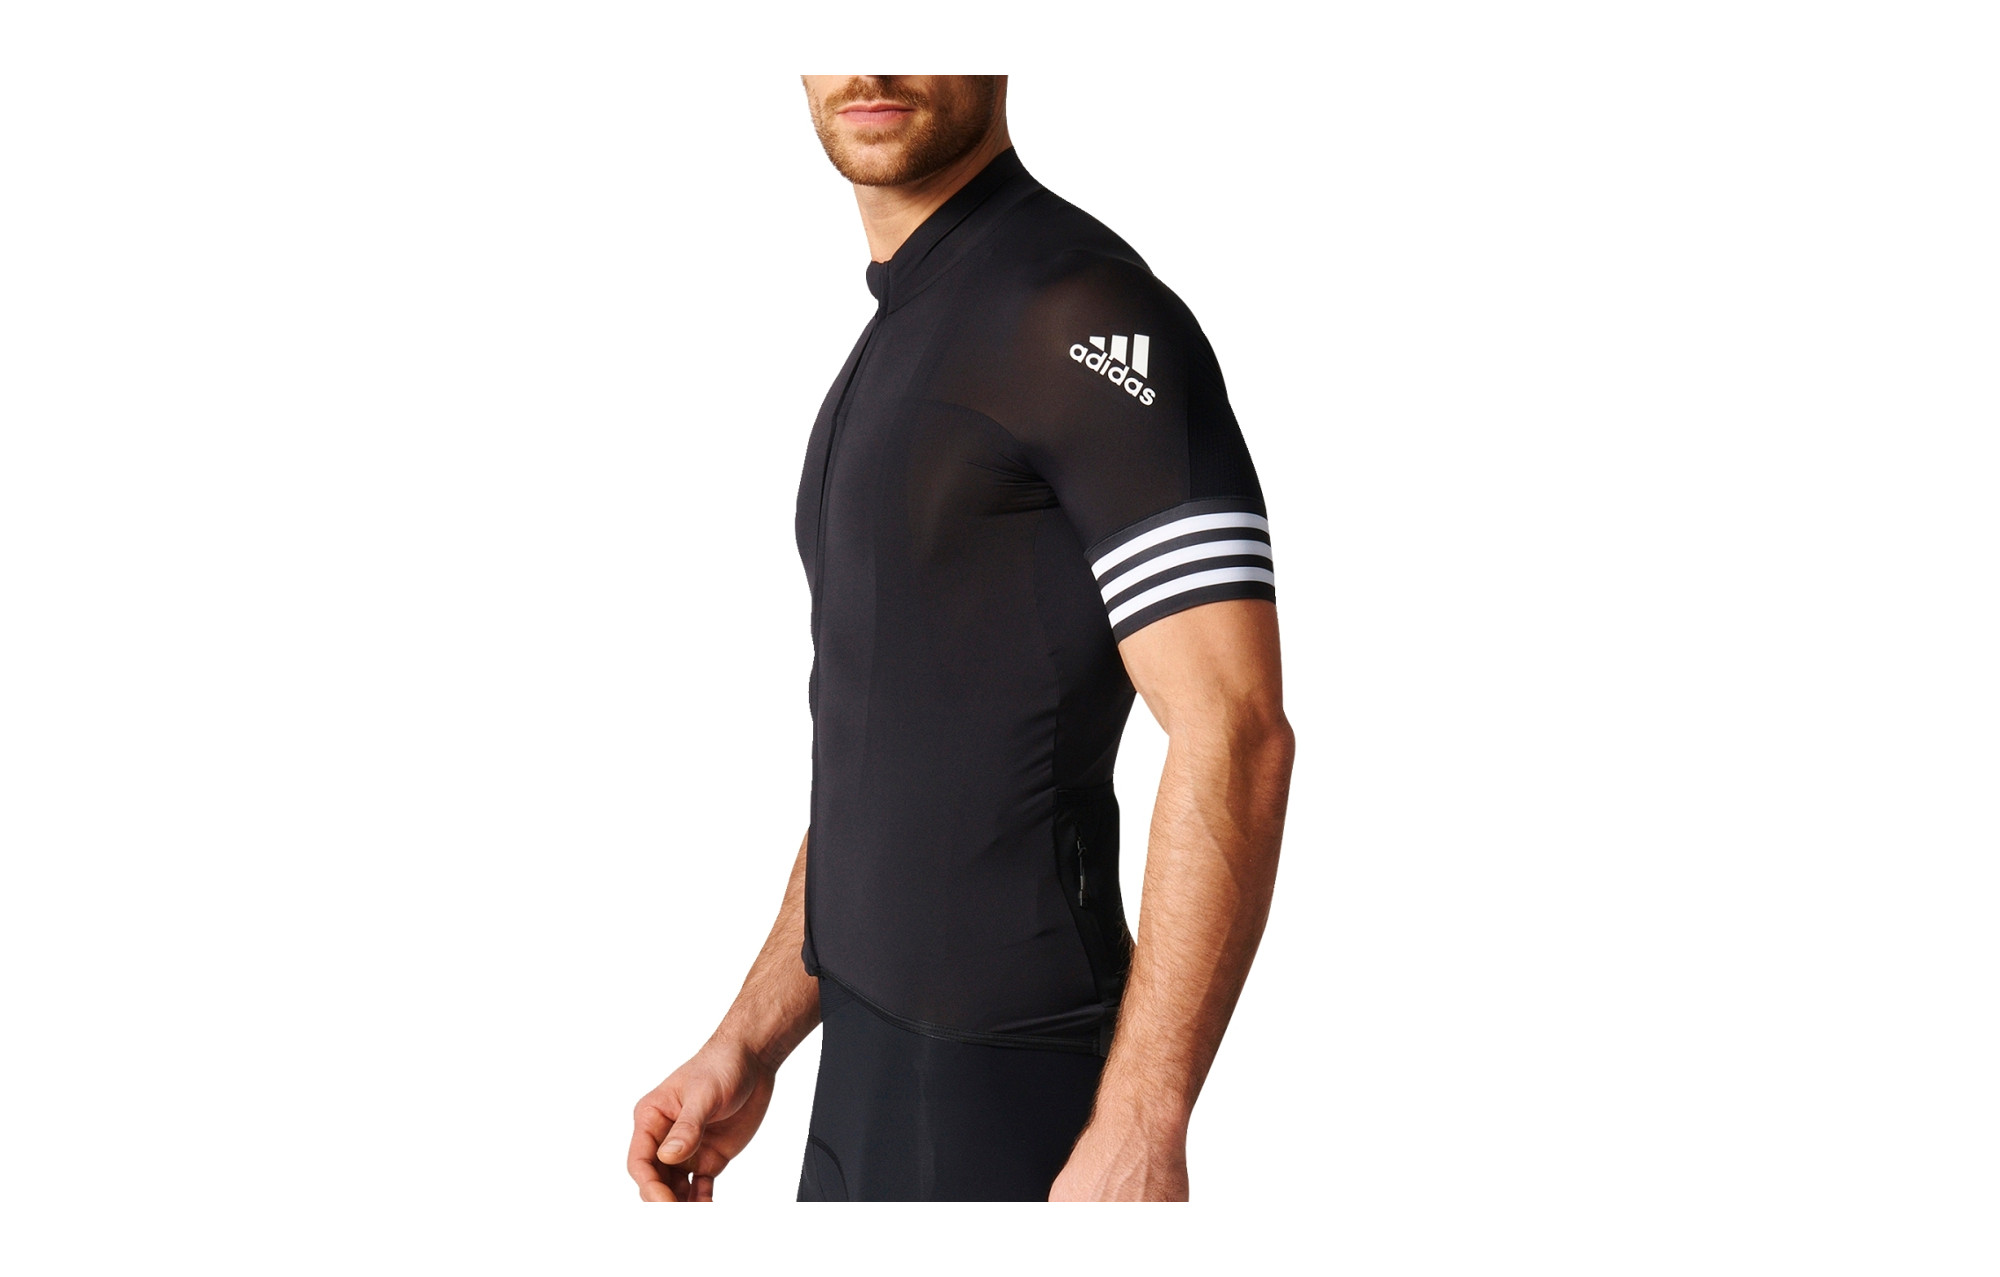 half off 7983e 69eb8 adidas cycling Short Sleeves Jersey ADISTAR CD.ZERO 3 Black